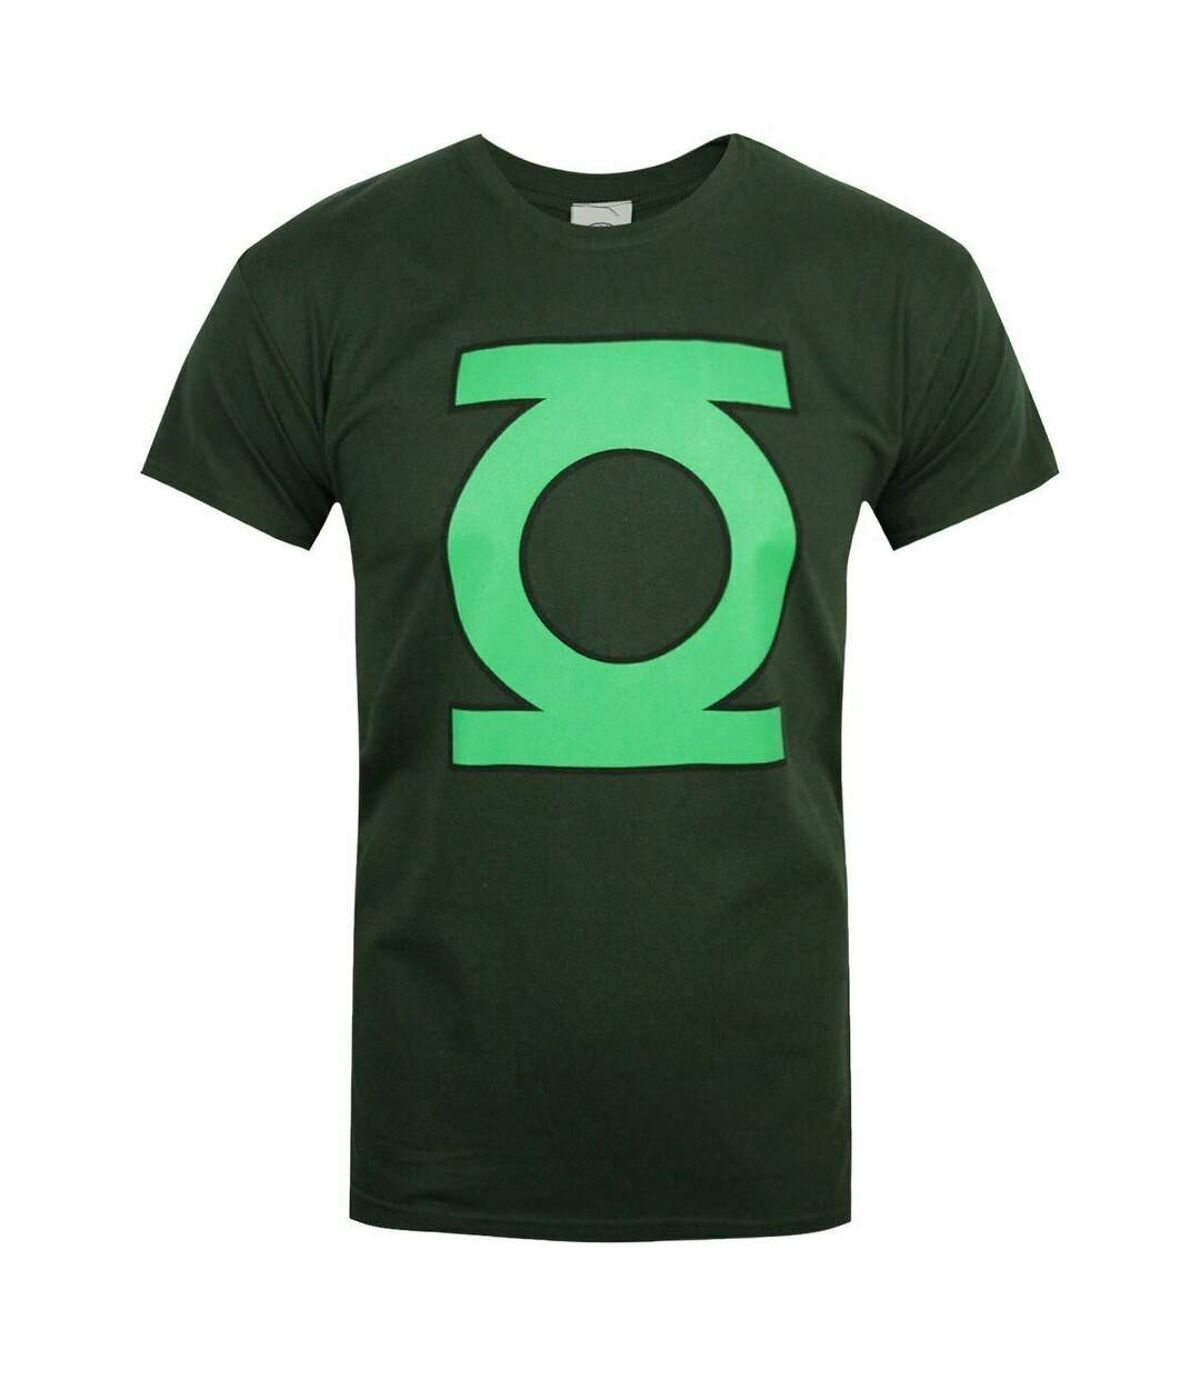 Green Lantern Mens Logo T-Shirt (Green) - UTNS5552